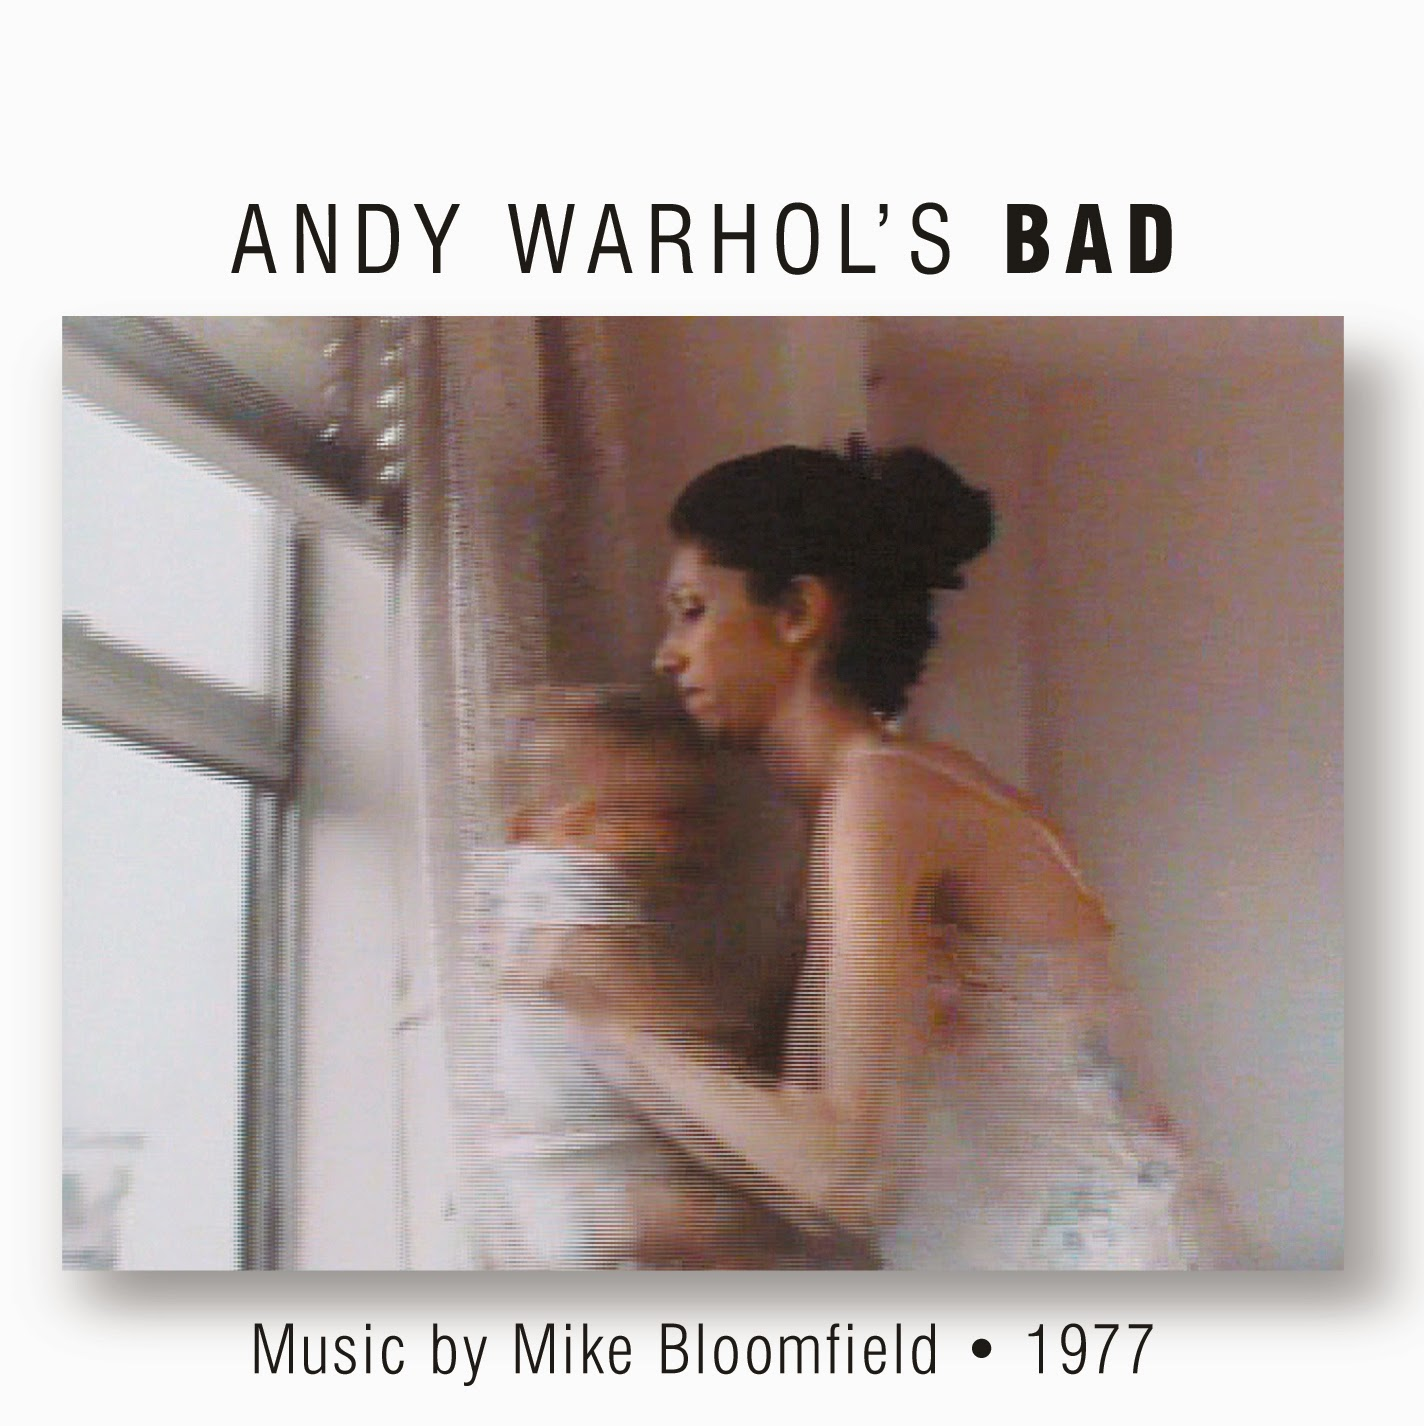 Susan Blond Warhol's Bad baby scene